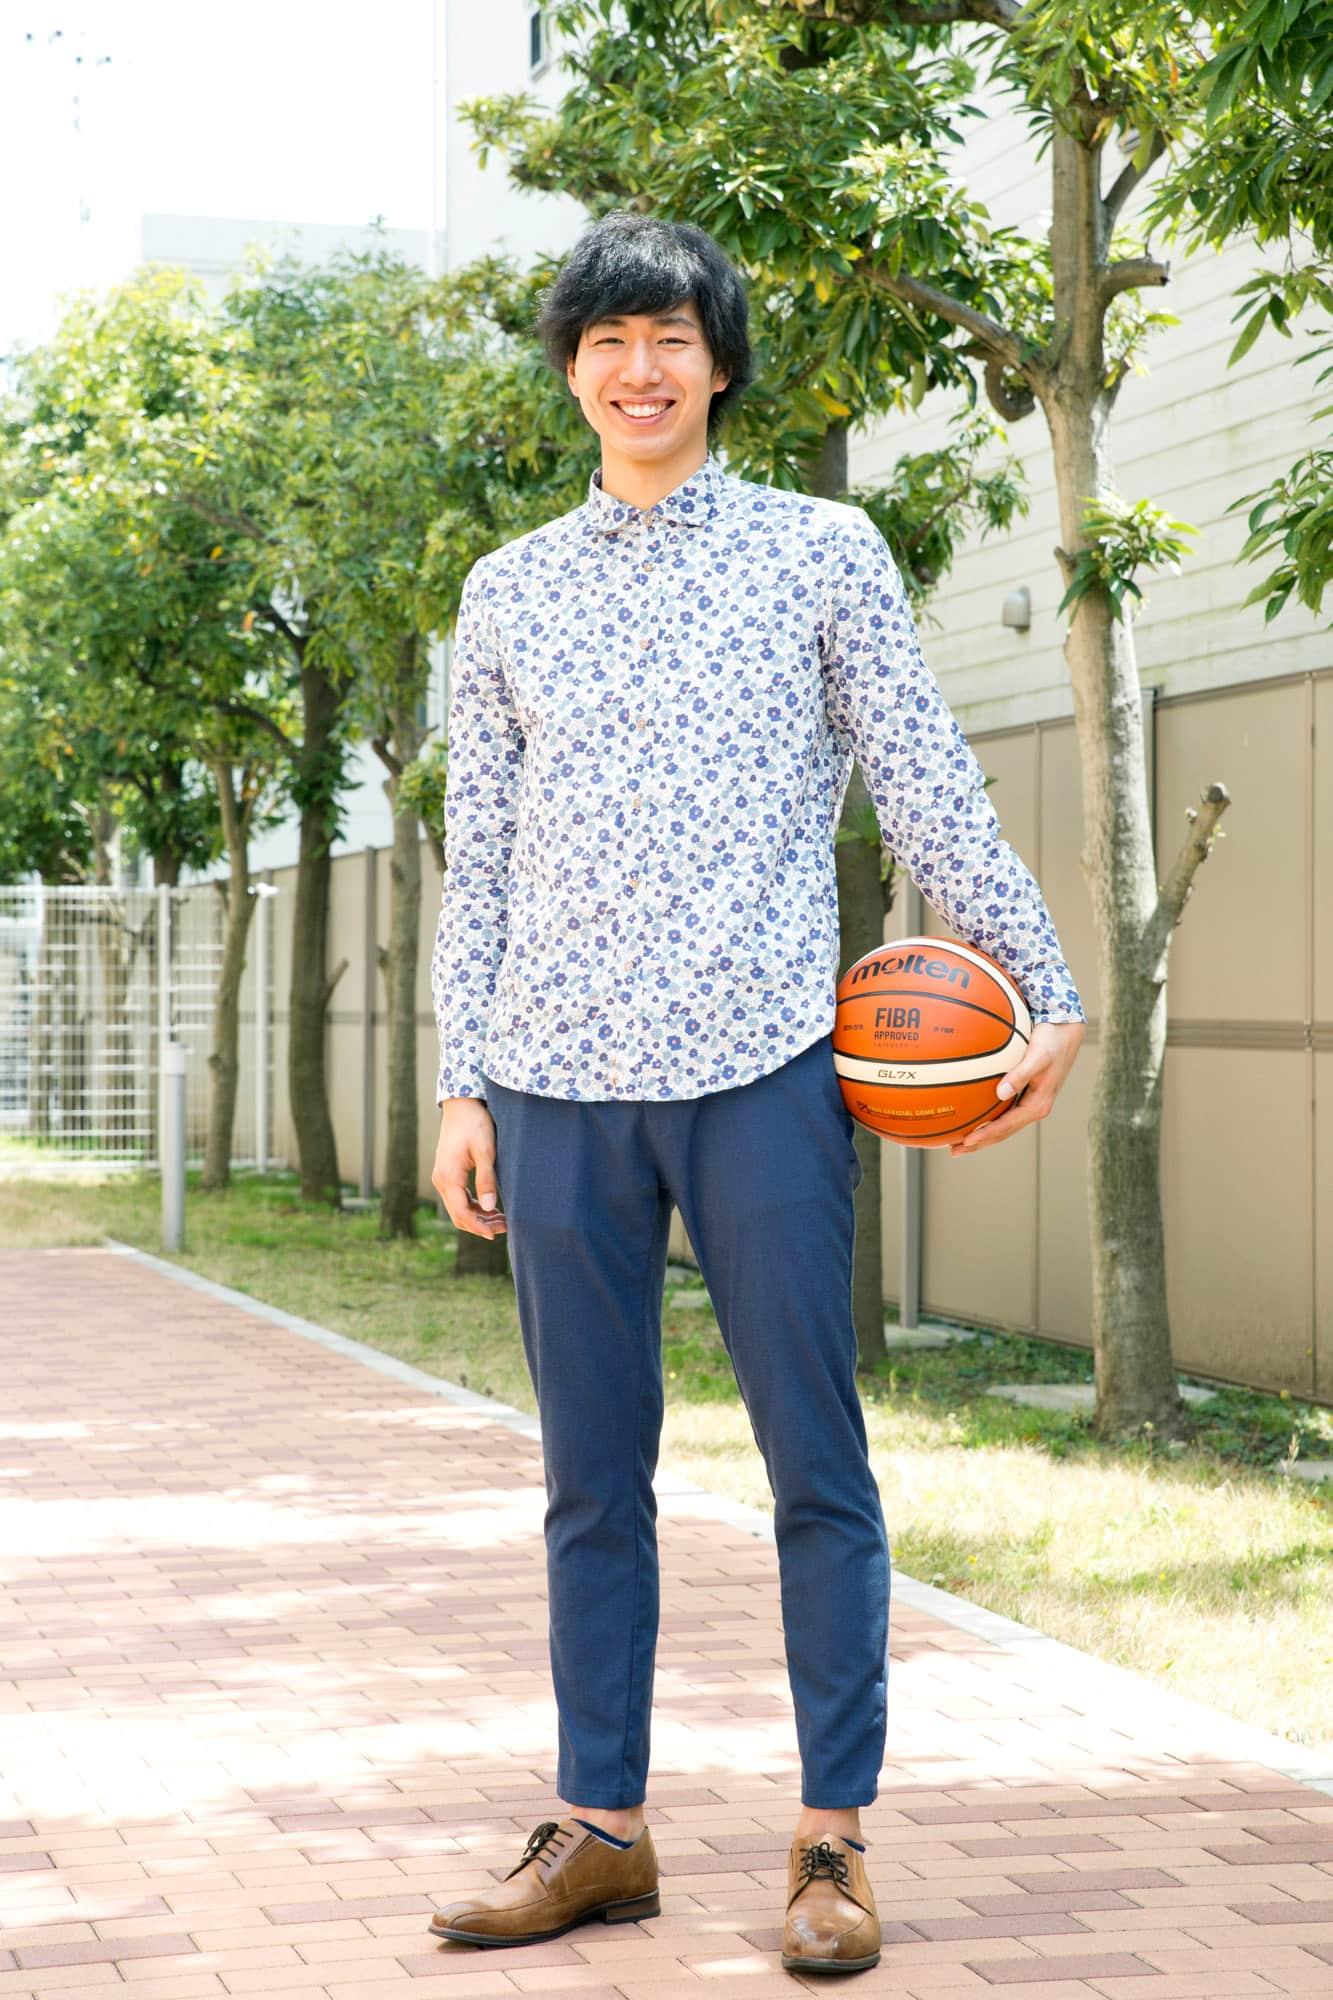 <Bリーグ×ファッションの密な関係Vol.4>「なんか……花柄を着てすみません(笑)」川崎ブレイブサンダース:林翔太郎選手・野本建吾選手・辻直人選手の普段着